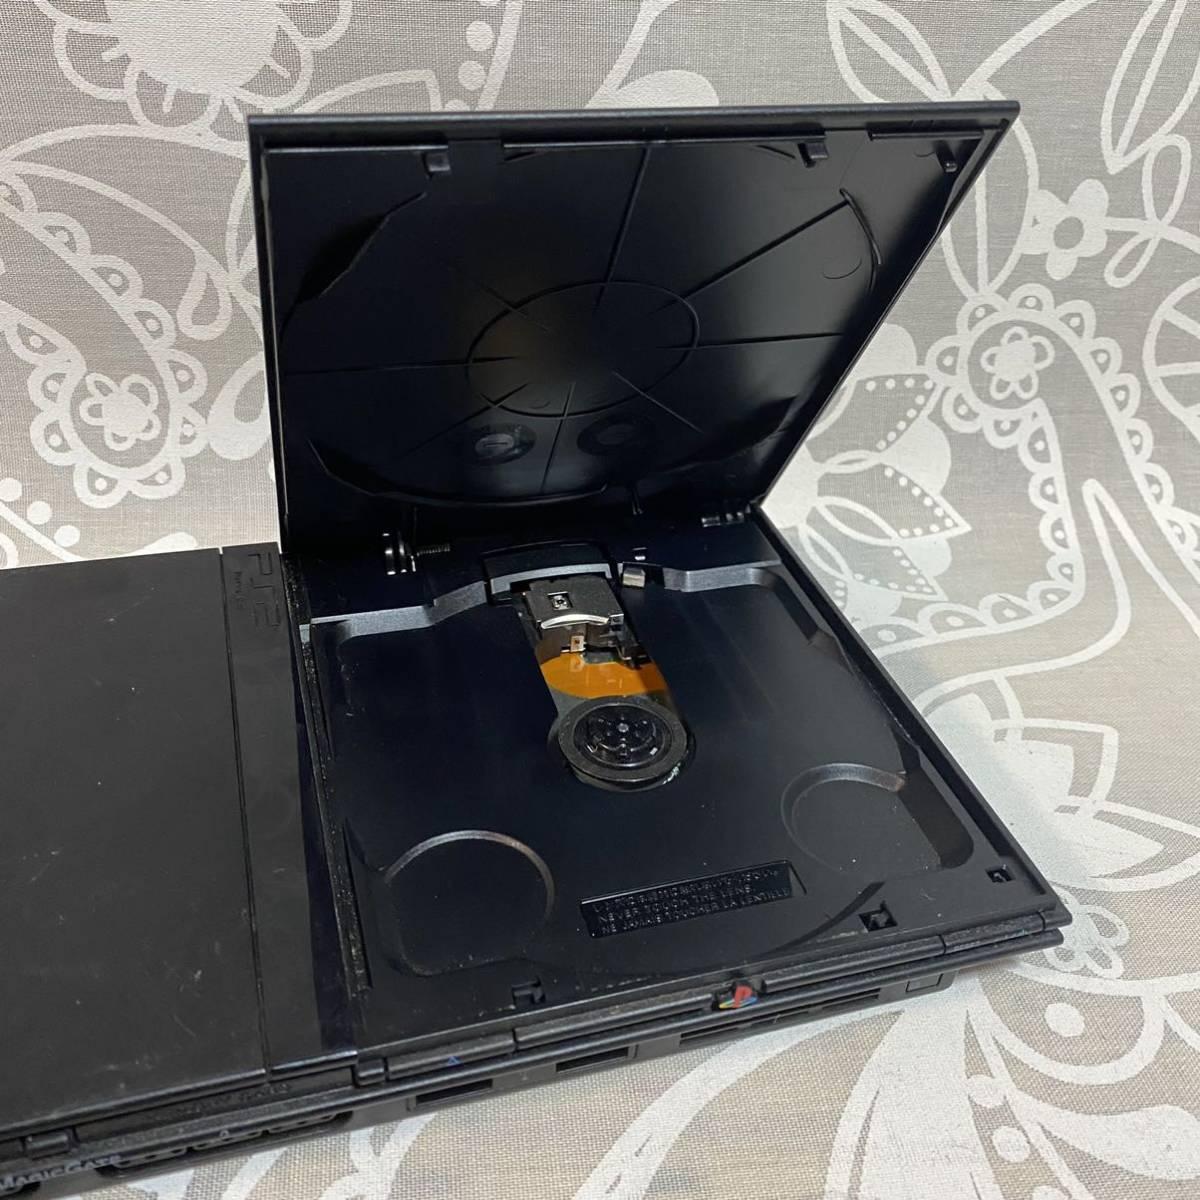 C 【動作品】 PS2 SCPH-70000 ブラック 薄型 SONY PlayStation2 プレステ2 プレイステーション 75000 77000 79000 90000 【本体のみ】